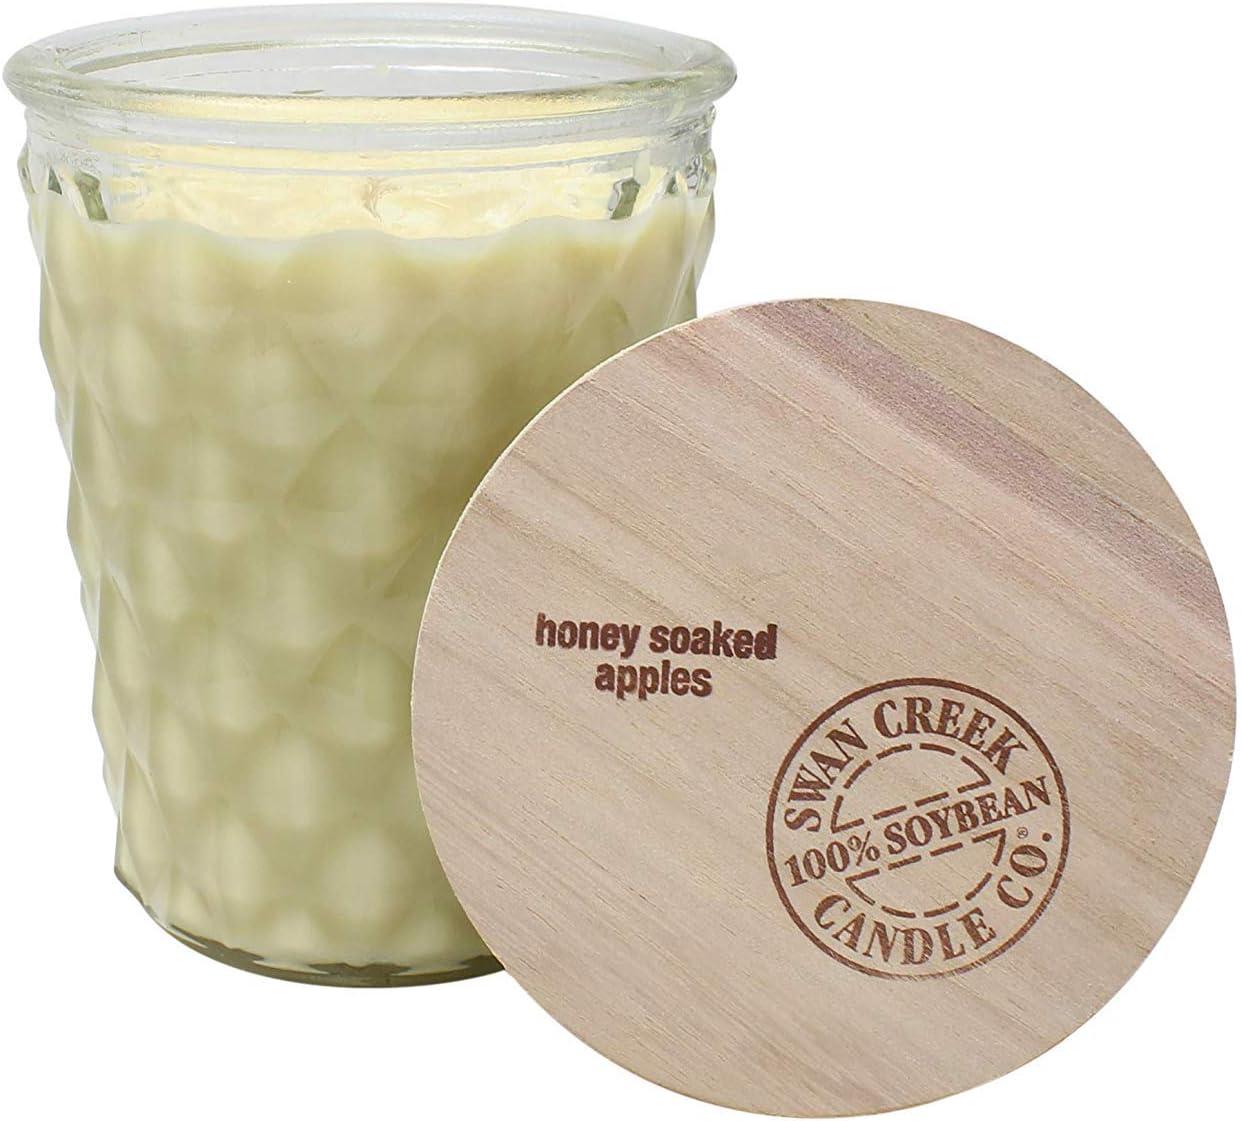 Swan Creek Timeless JAR 12OZ Honey Soaked Apples